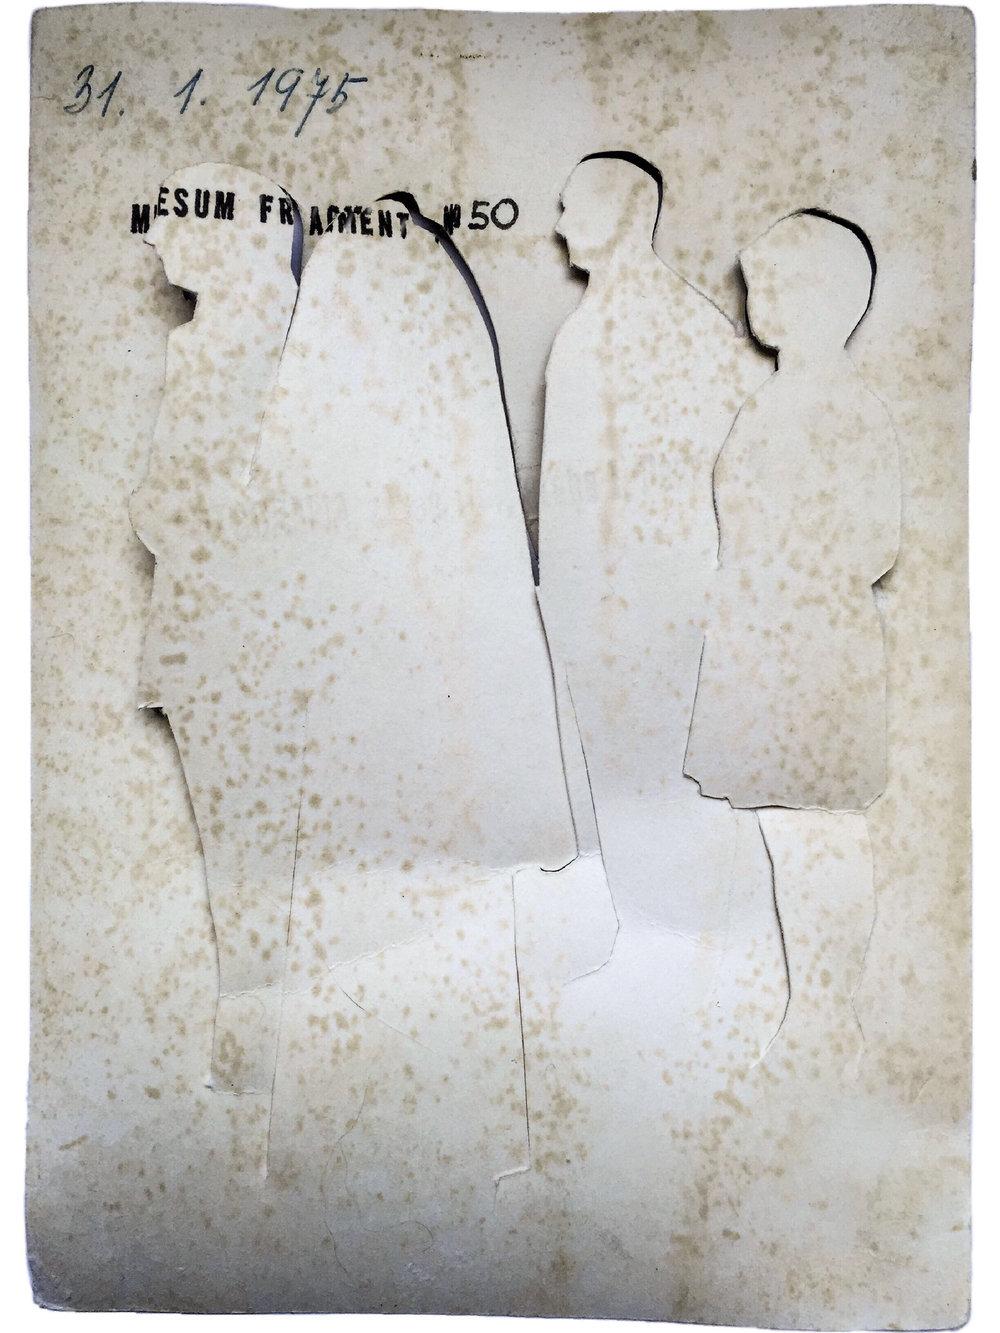 Muesum Fragment No 50 -